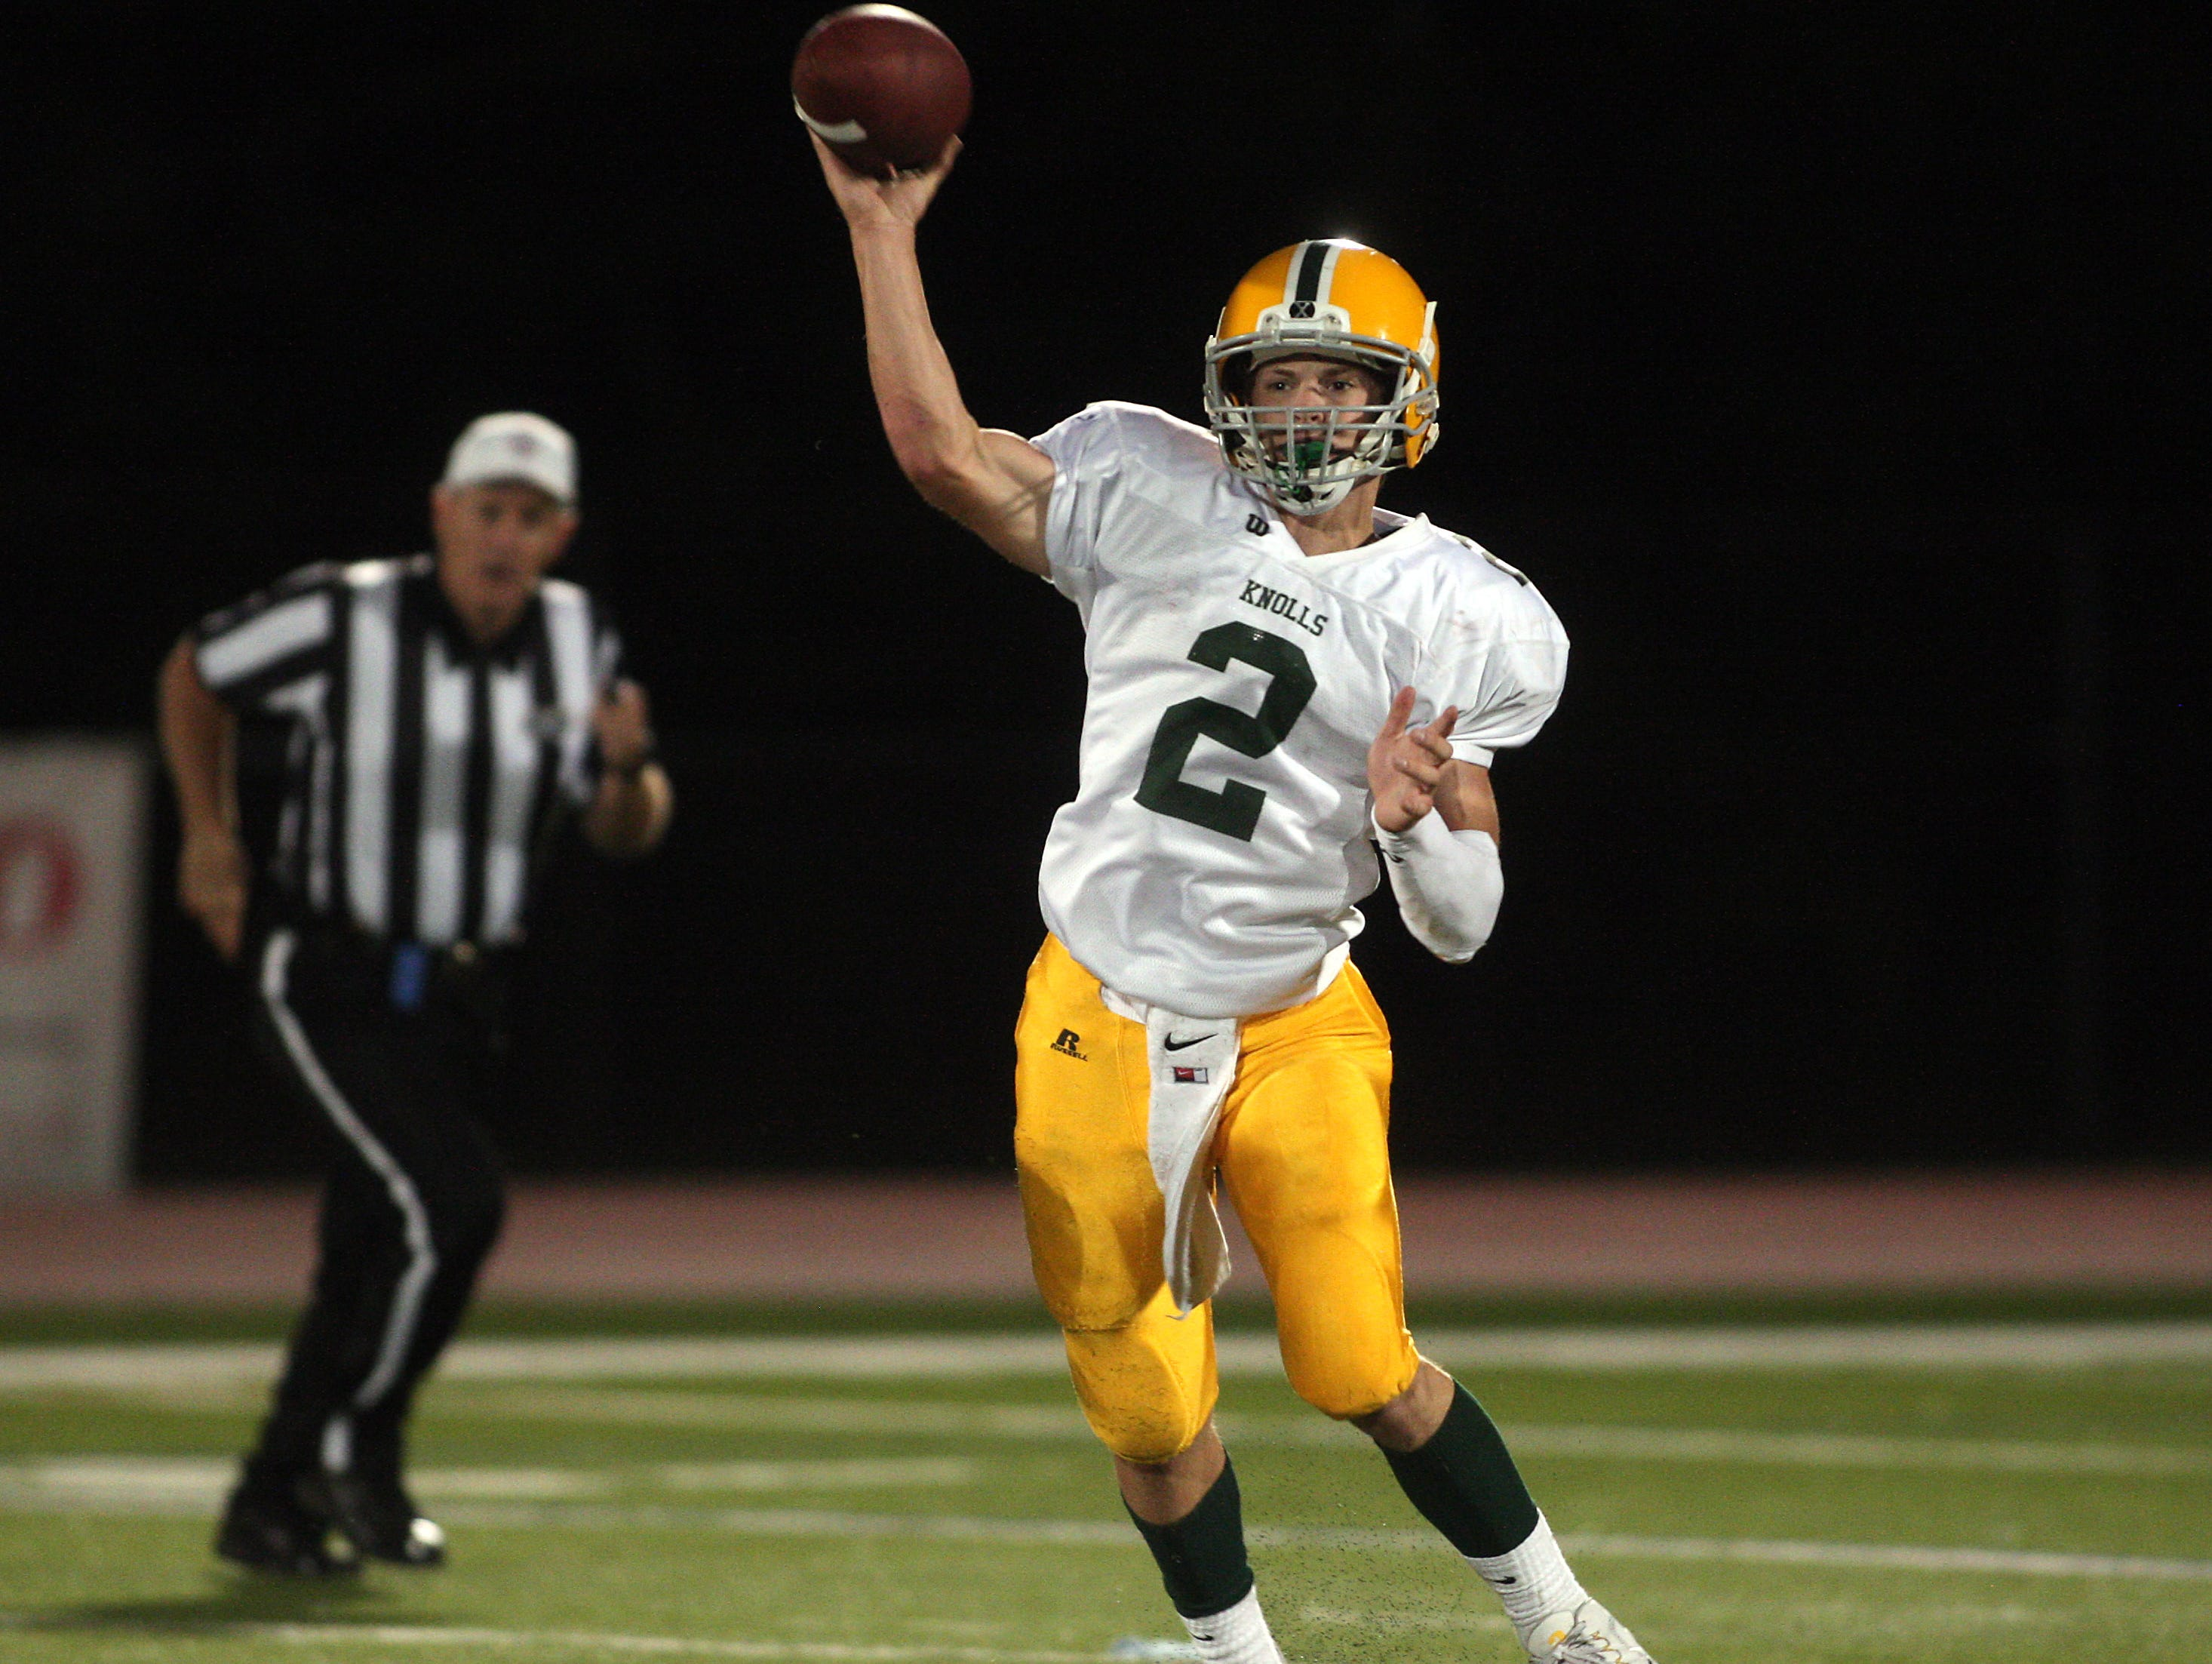 Morris Knolls quarterback Nick Vittorio throws vs Roxbury during their football Friday night matchup. September 25, 2015, Roxbury, NJ.